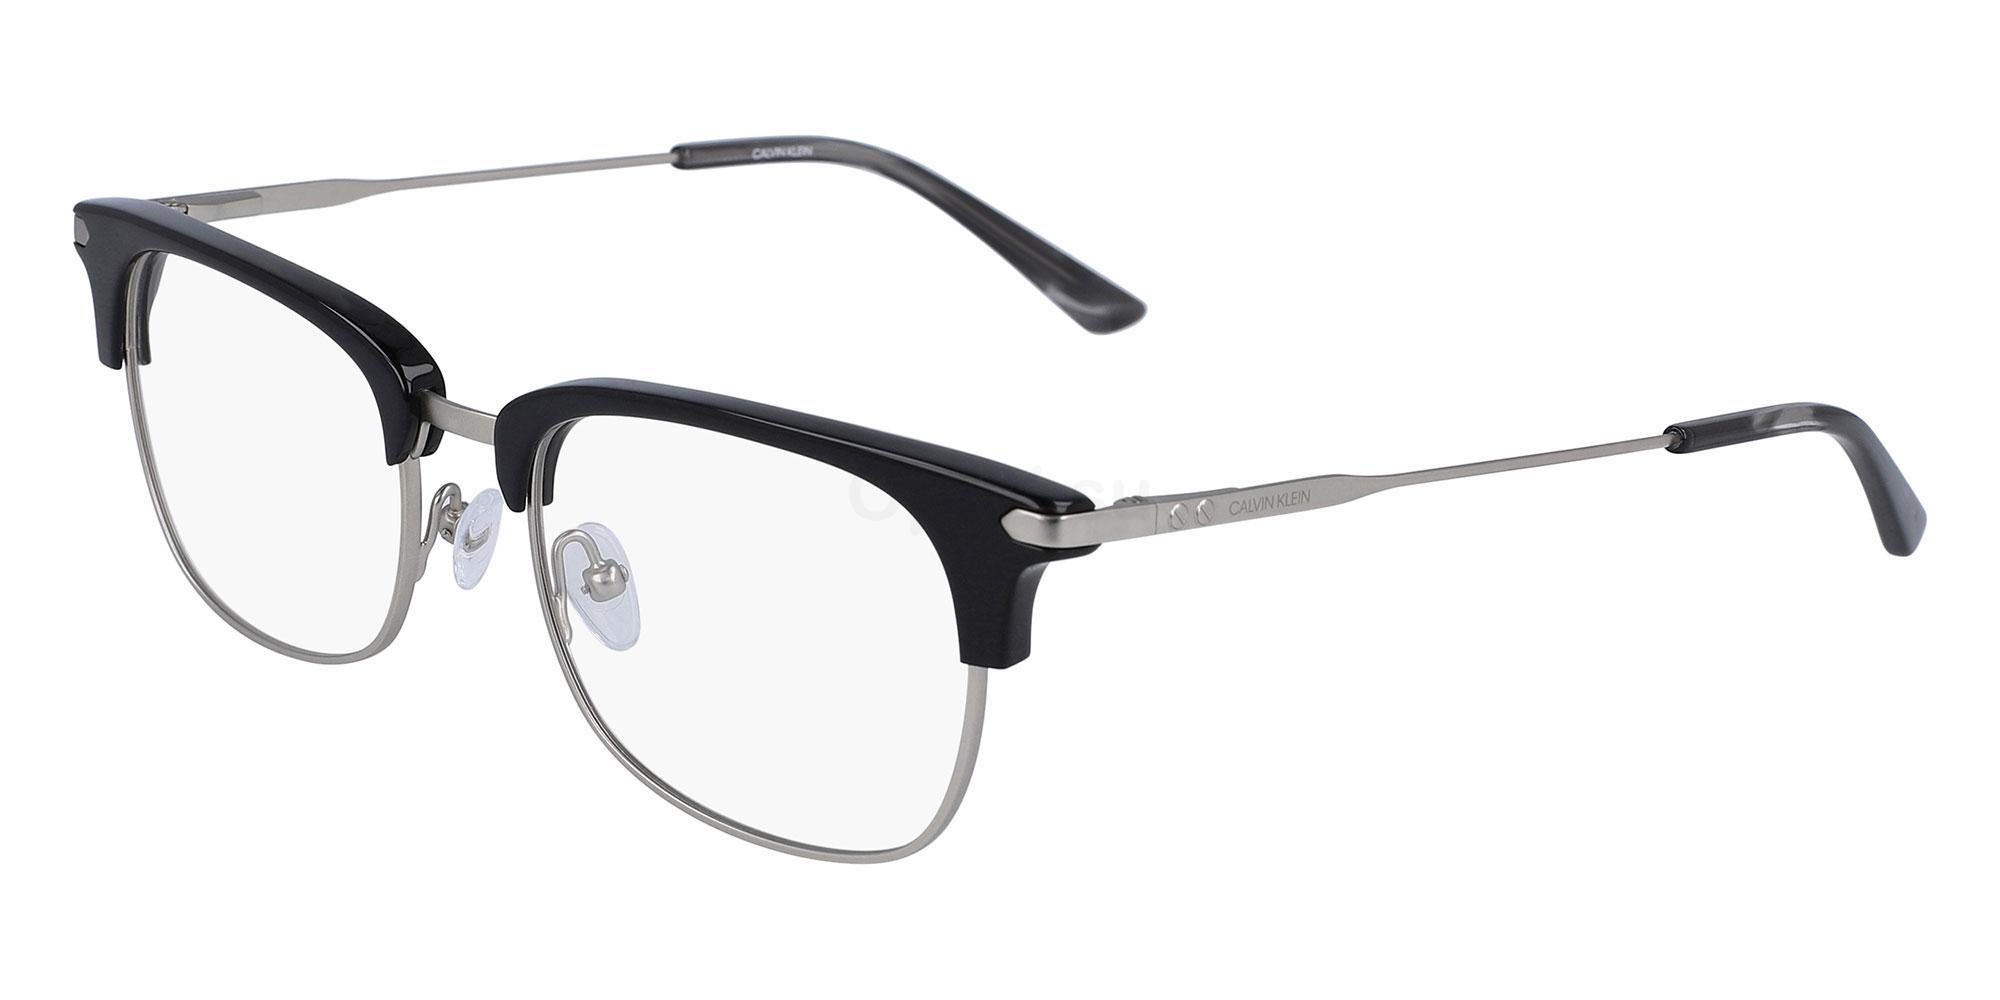 001 CK19105 Glasses, Calvin Klein